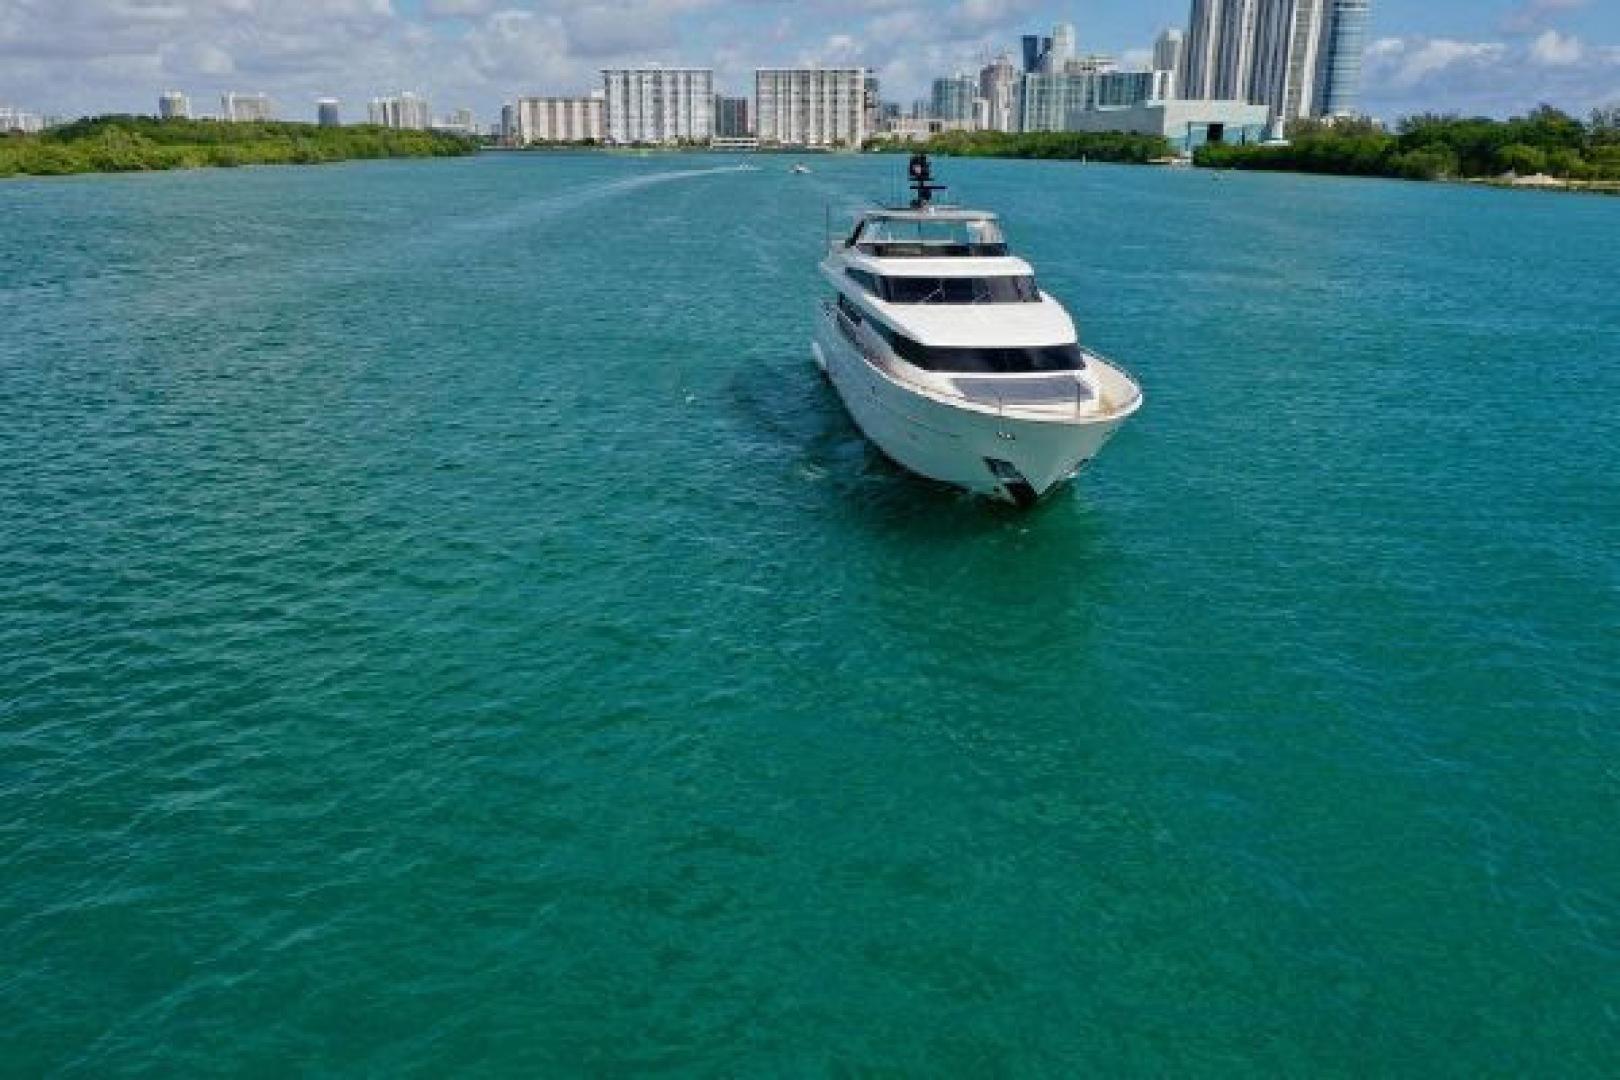 Sanlorenzo-SL94 2012-Sanlorenzo SL94 Aventura-Florida-United States-1637127 | Thumbnail